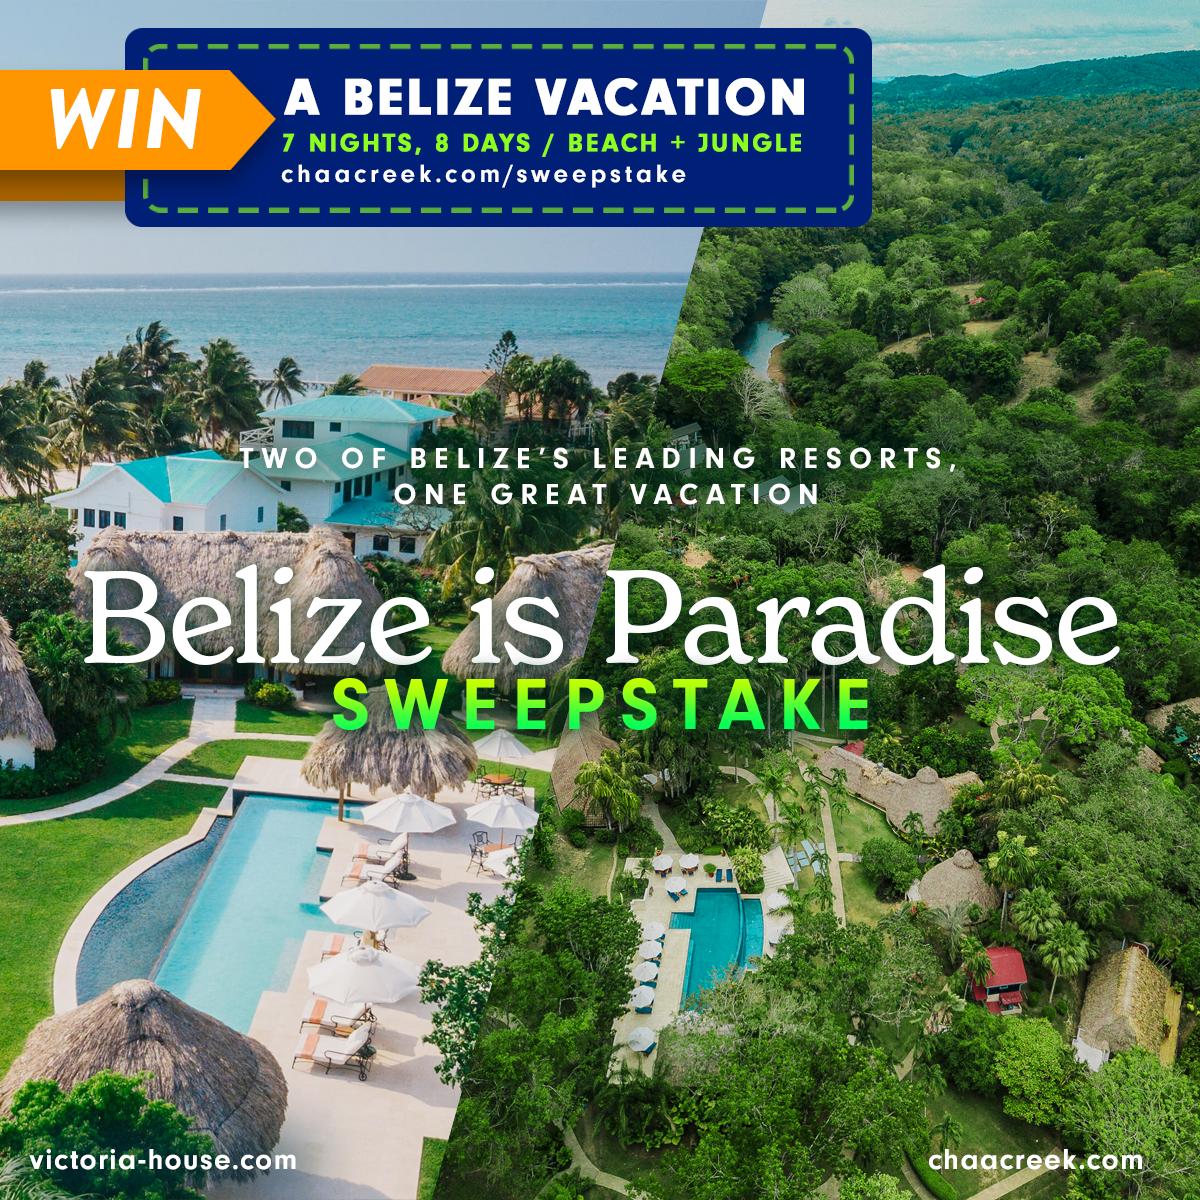 belize-is-paradise-chaa-creek-sweepstake-belize-win